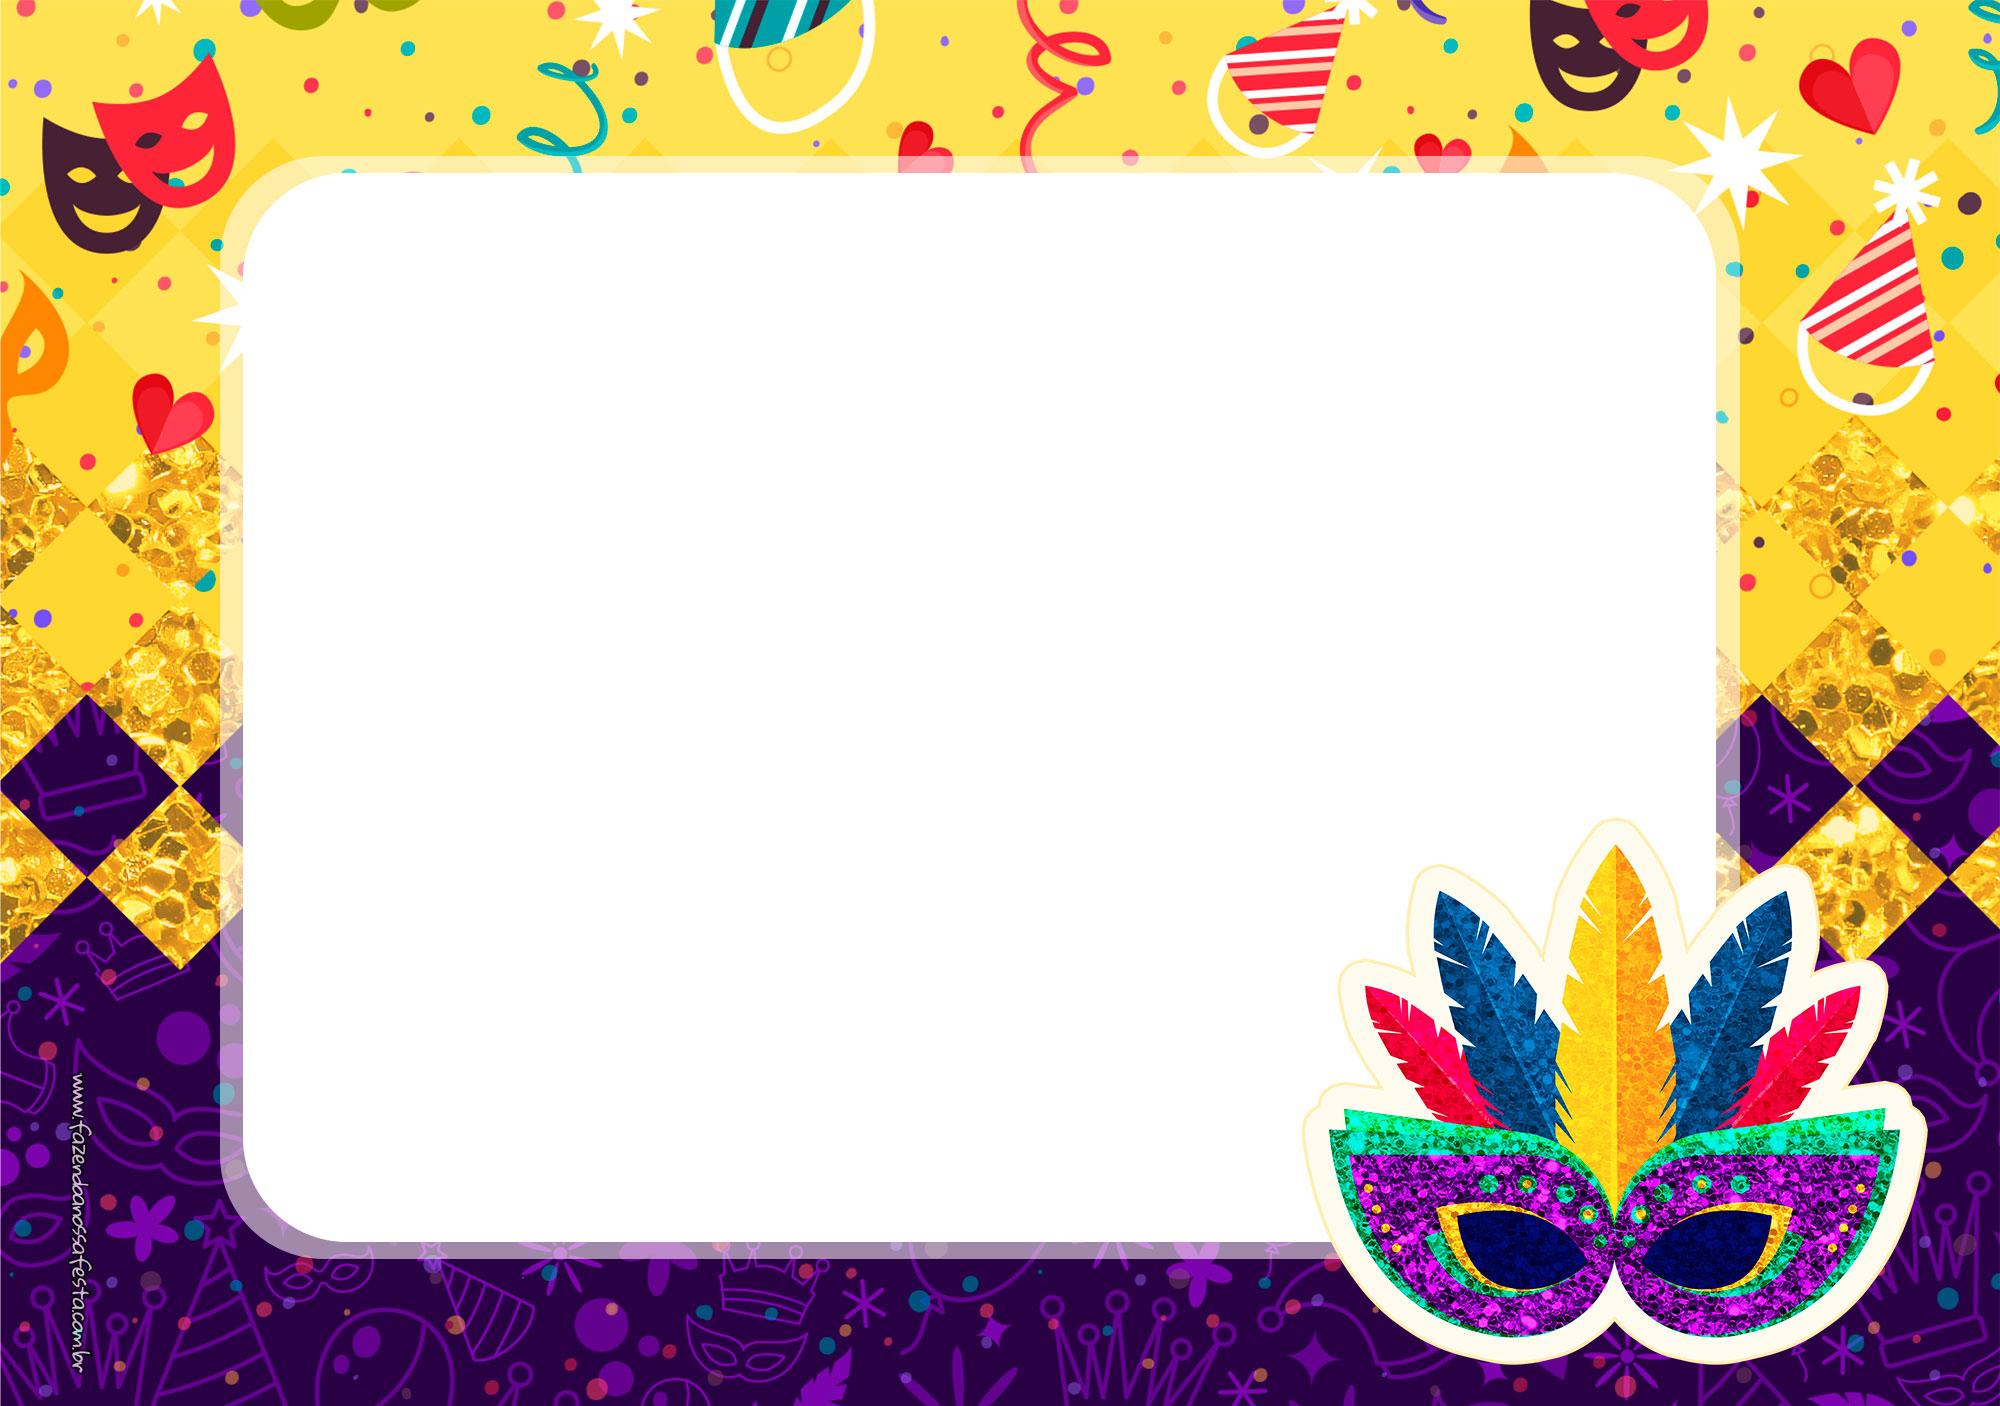 Convite com foto 2 de Carnaval